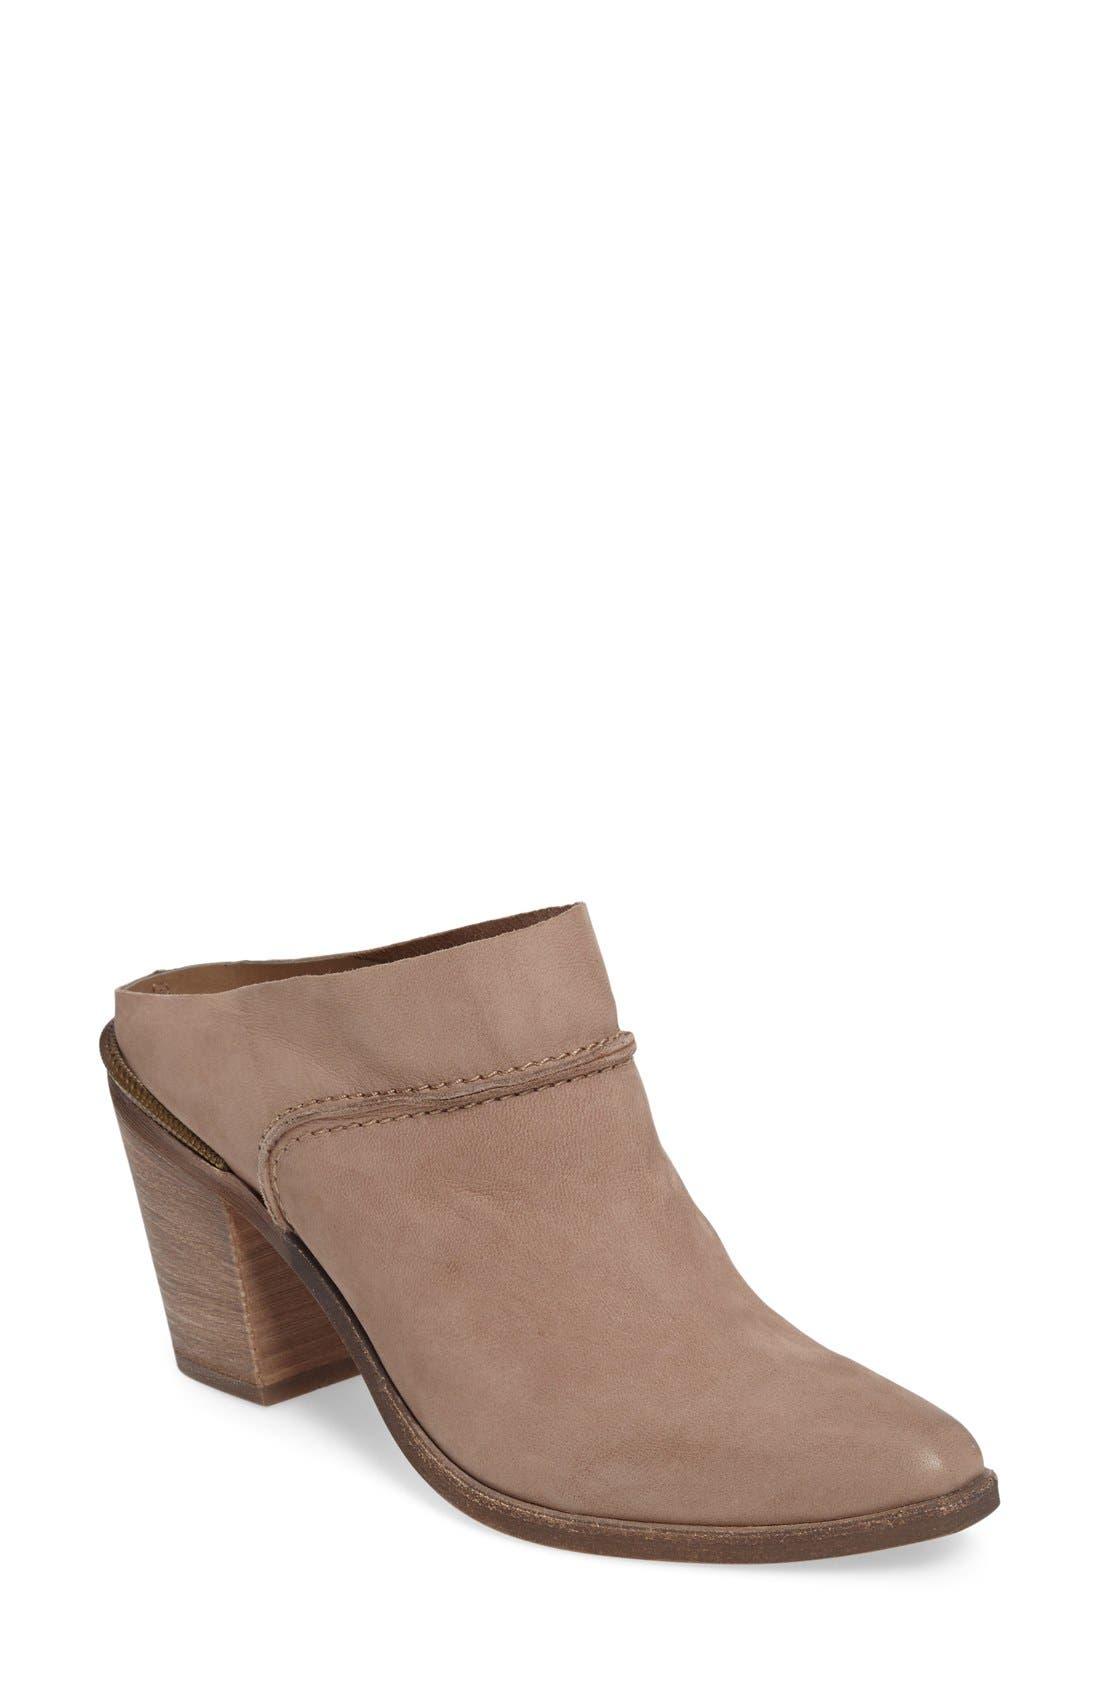 Alternate Image 1 Selected - Dolce Vita Wes Block Heel Mule (Women)